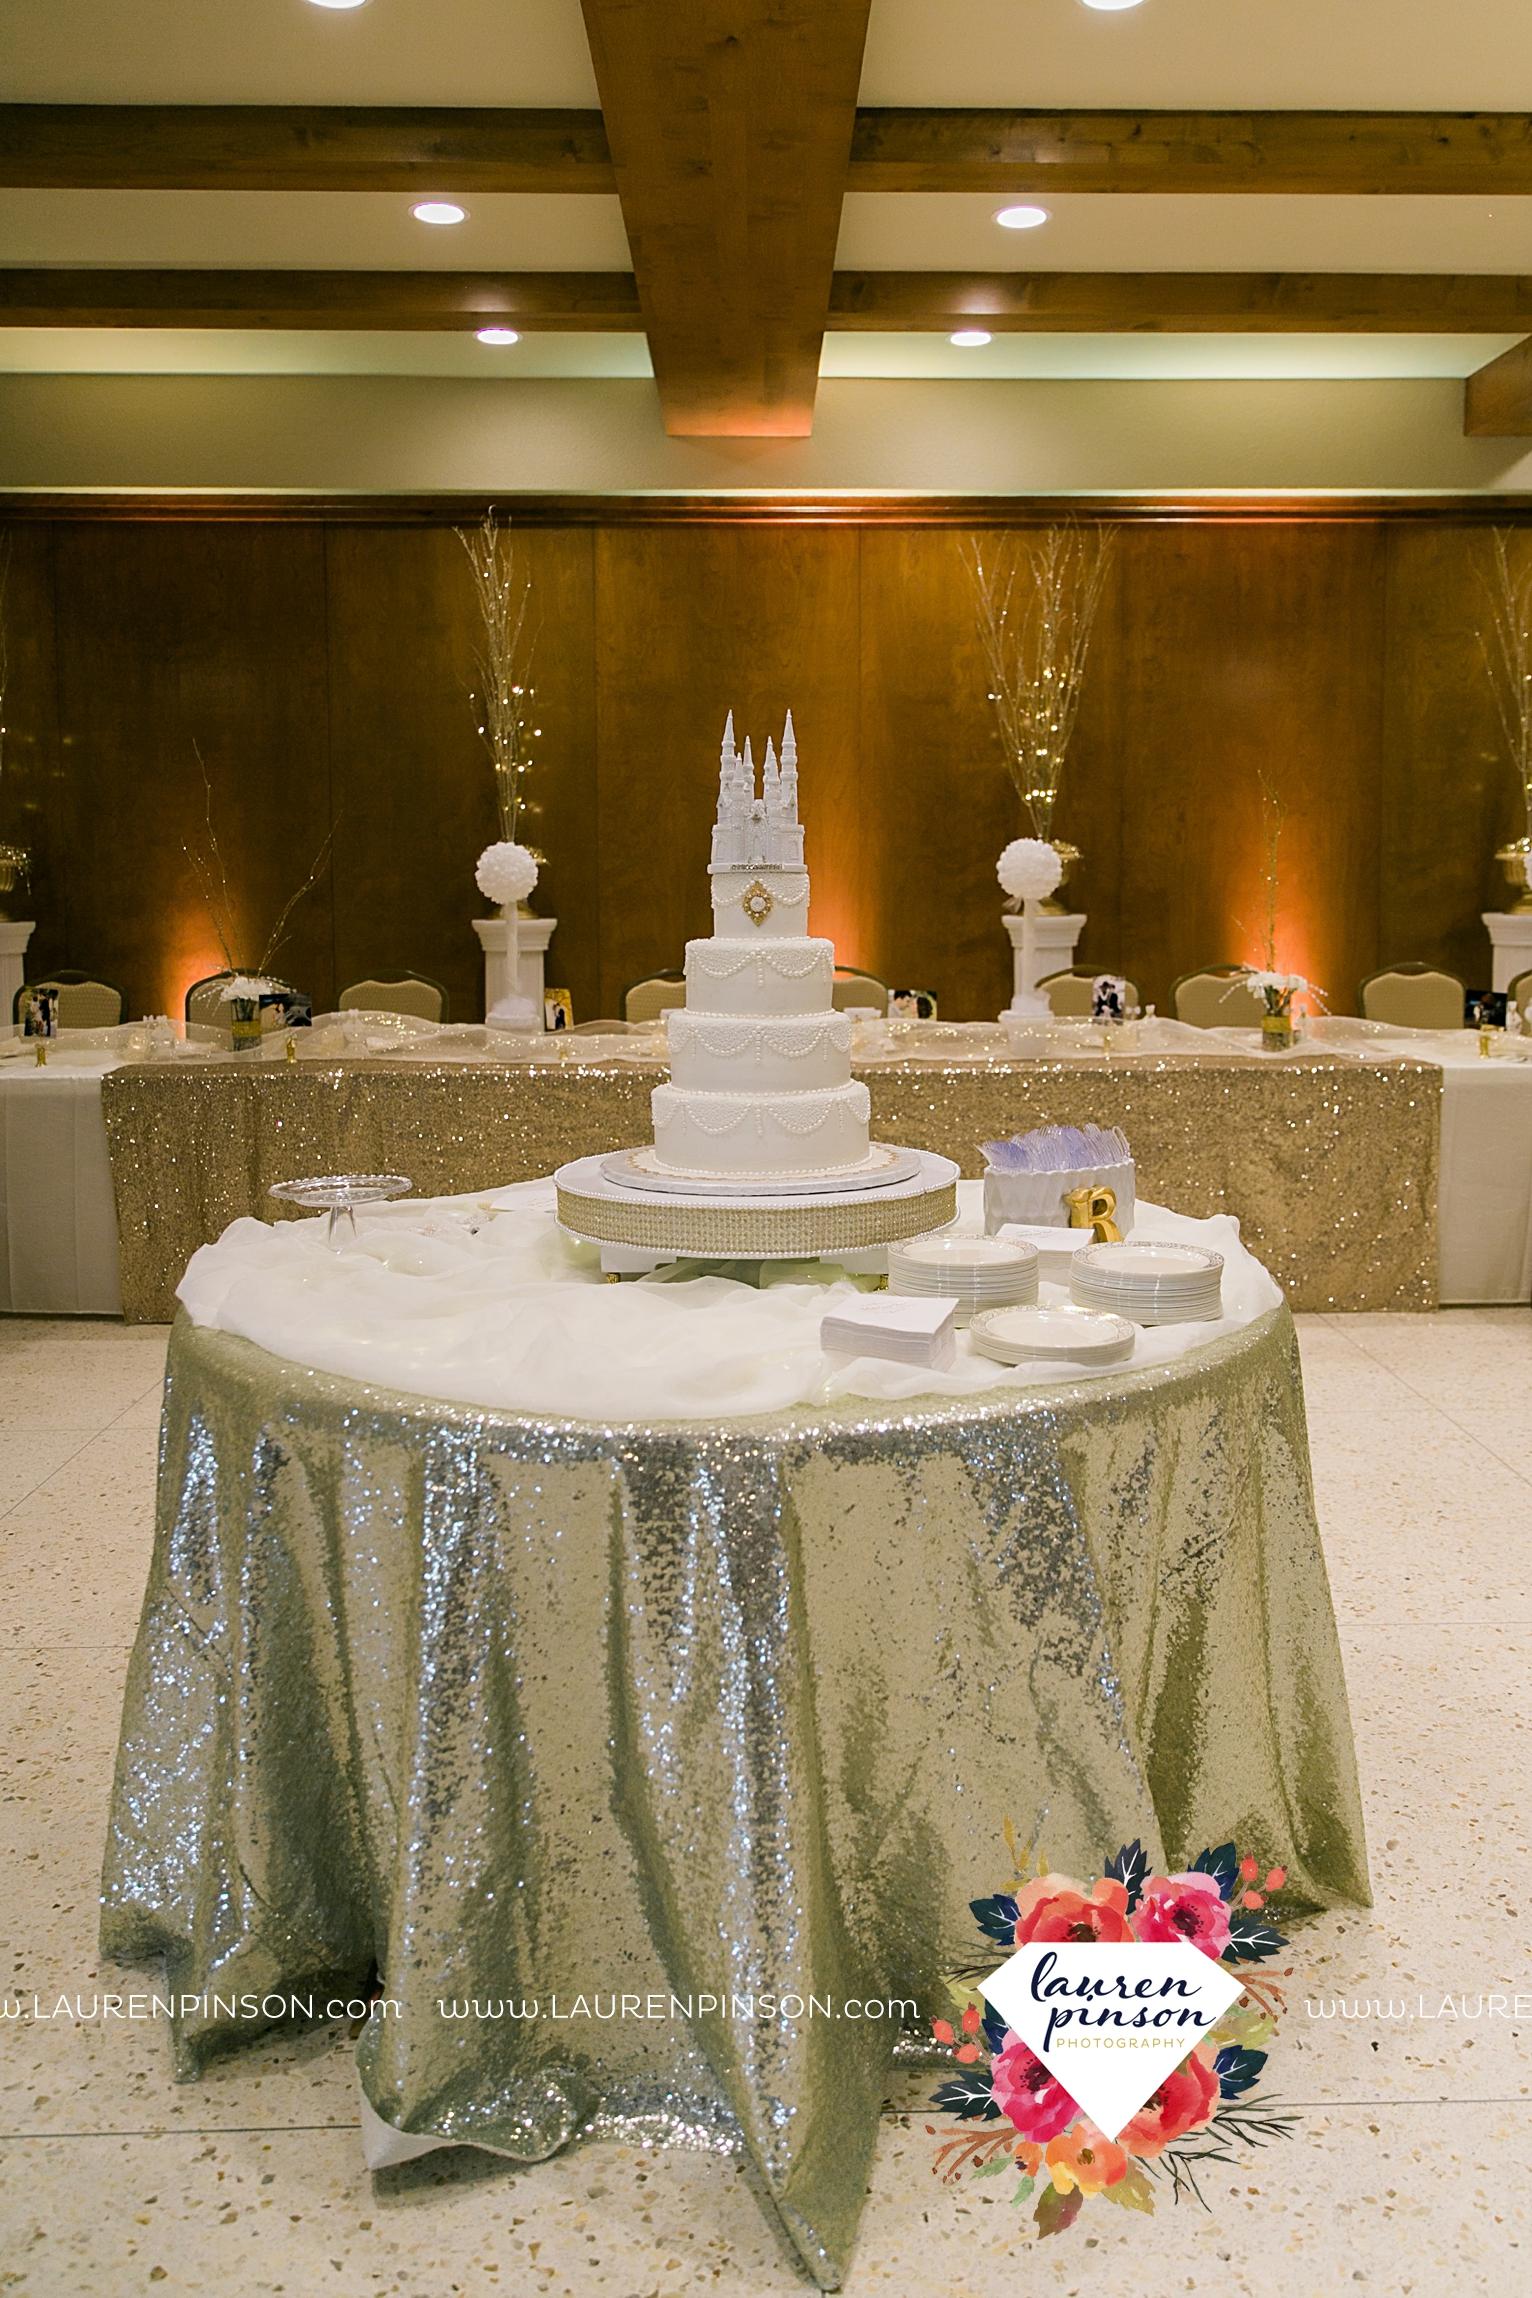 wichita-falls-texas-wedding-photographer-the-forum-by-the-kemp-mayfield-events-ulta-gold-glitter_2858.jpg